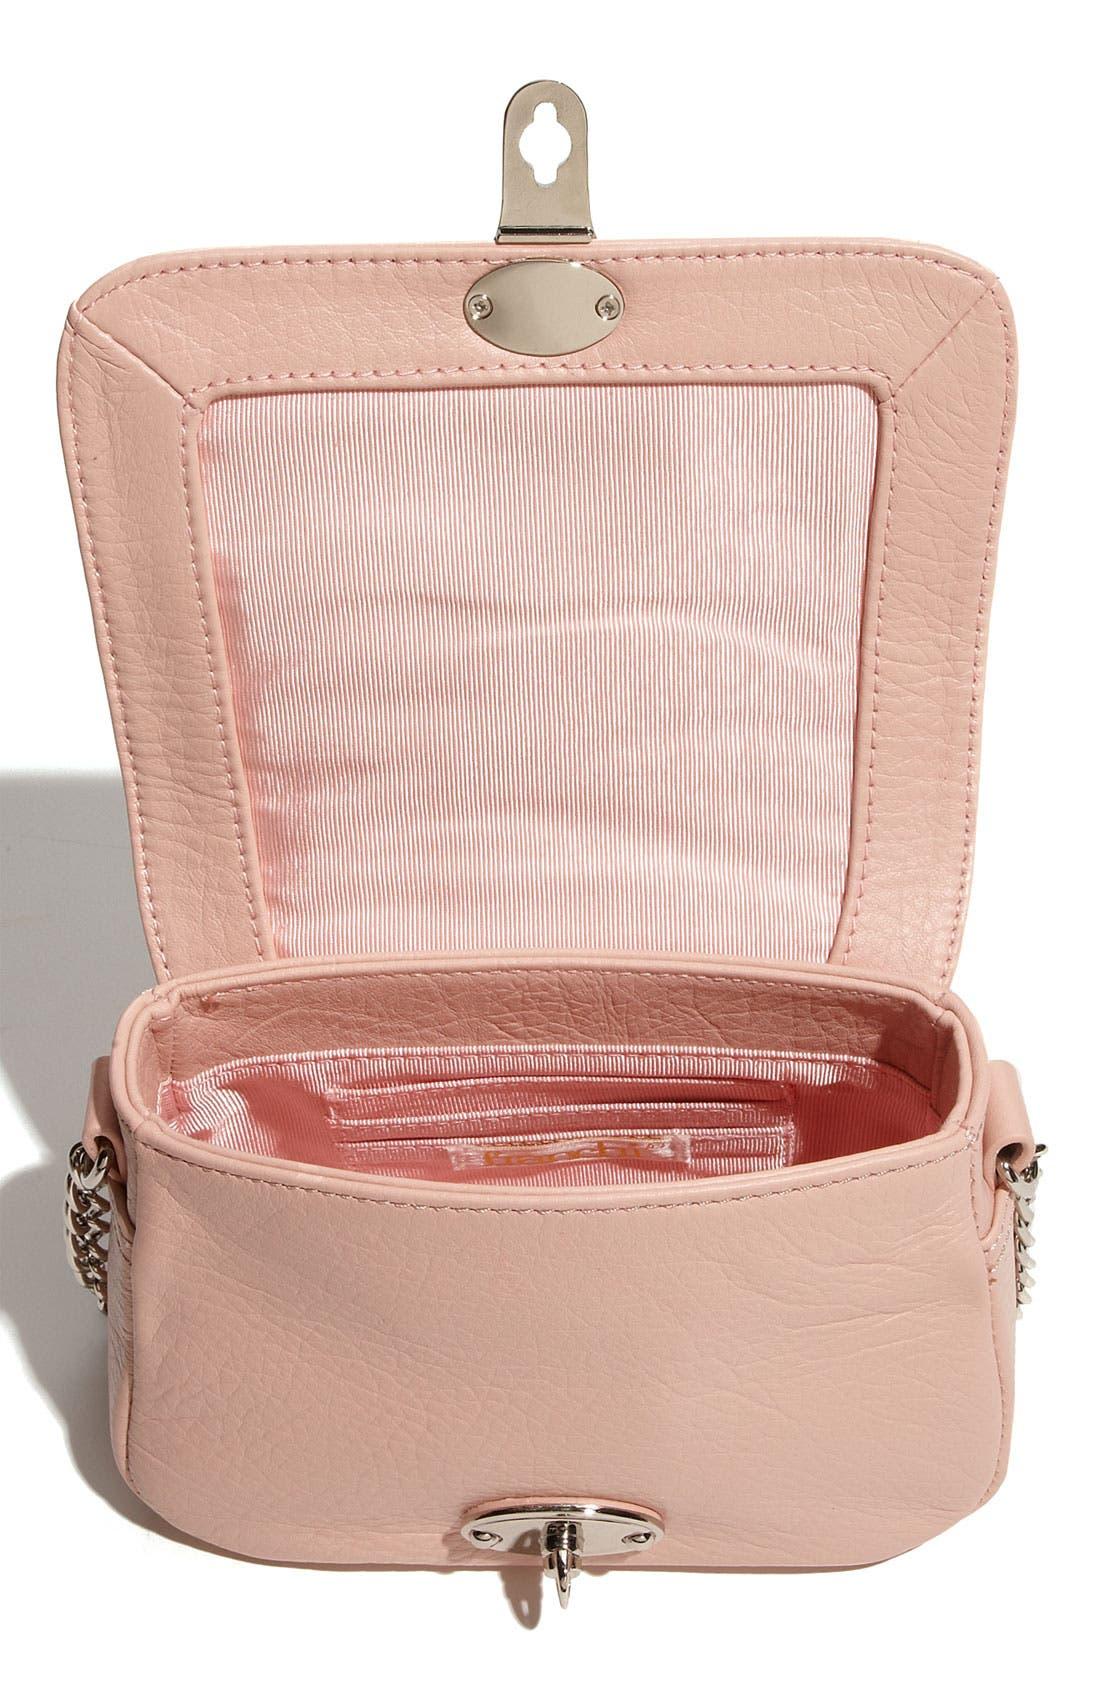 Alternate Image 3  - Franchi Leather Flap Crossbody Bag